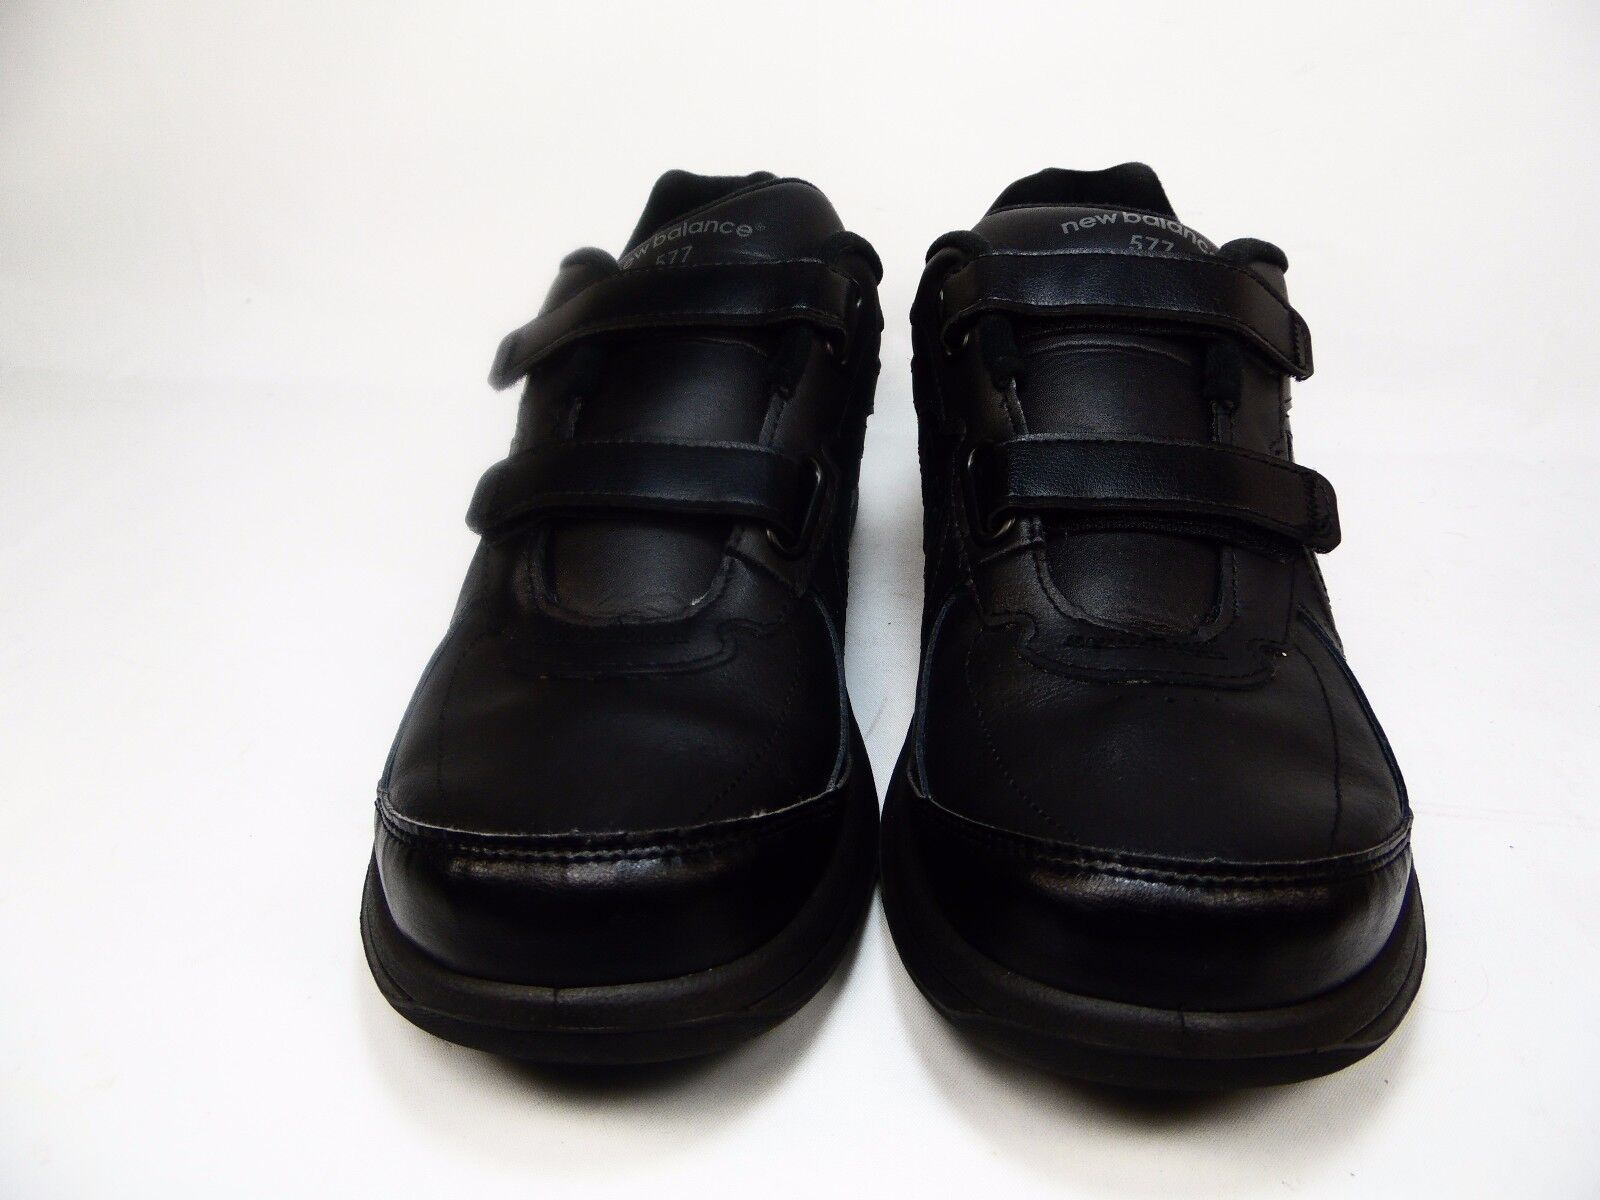 New Balance 577 Mens Walking shoes Black Size 11D